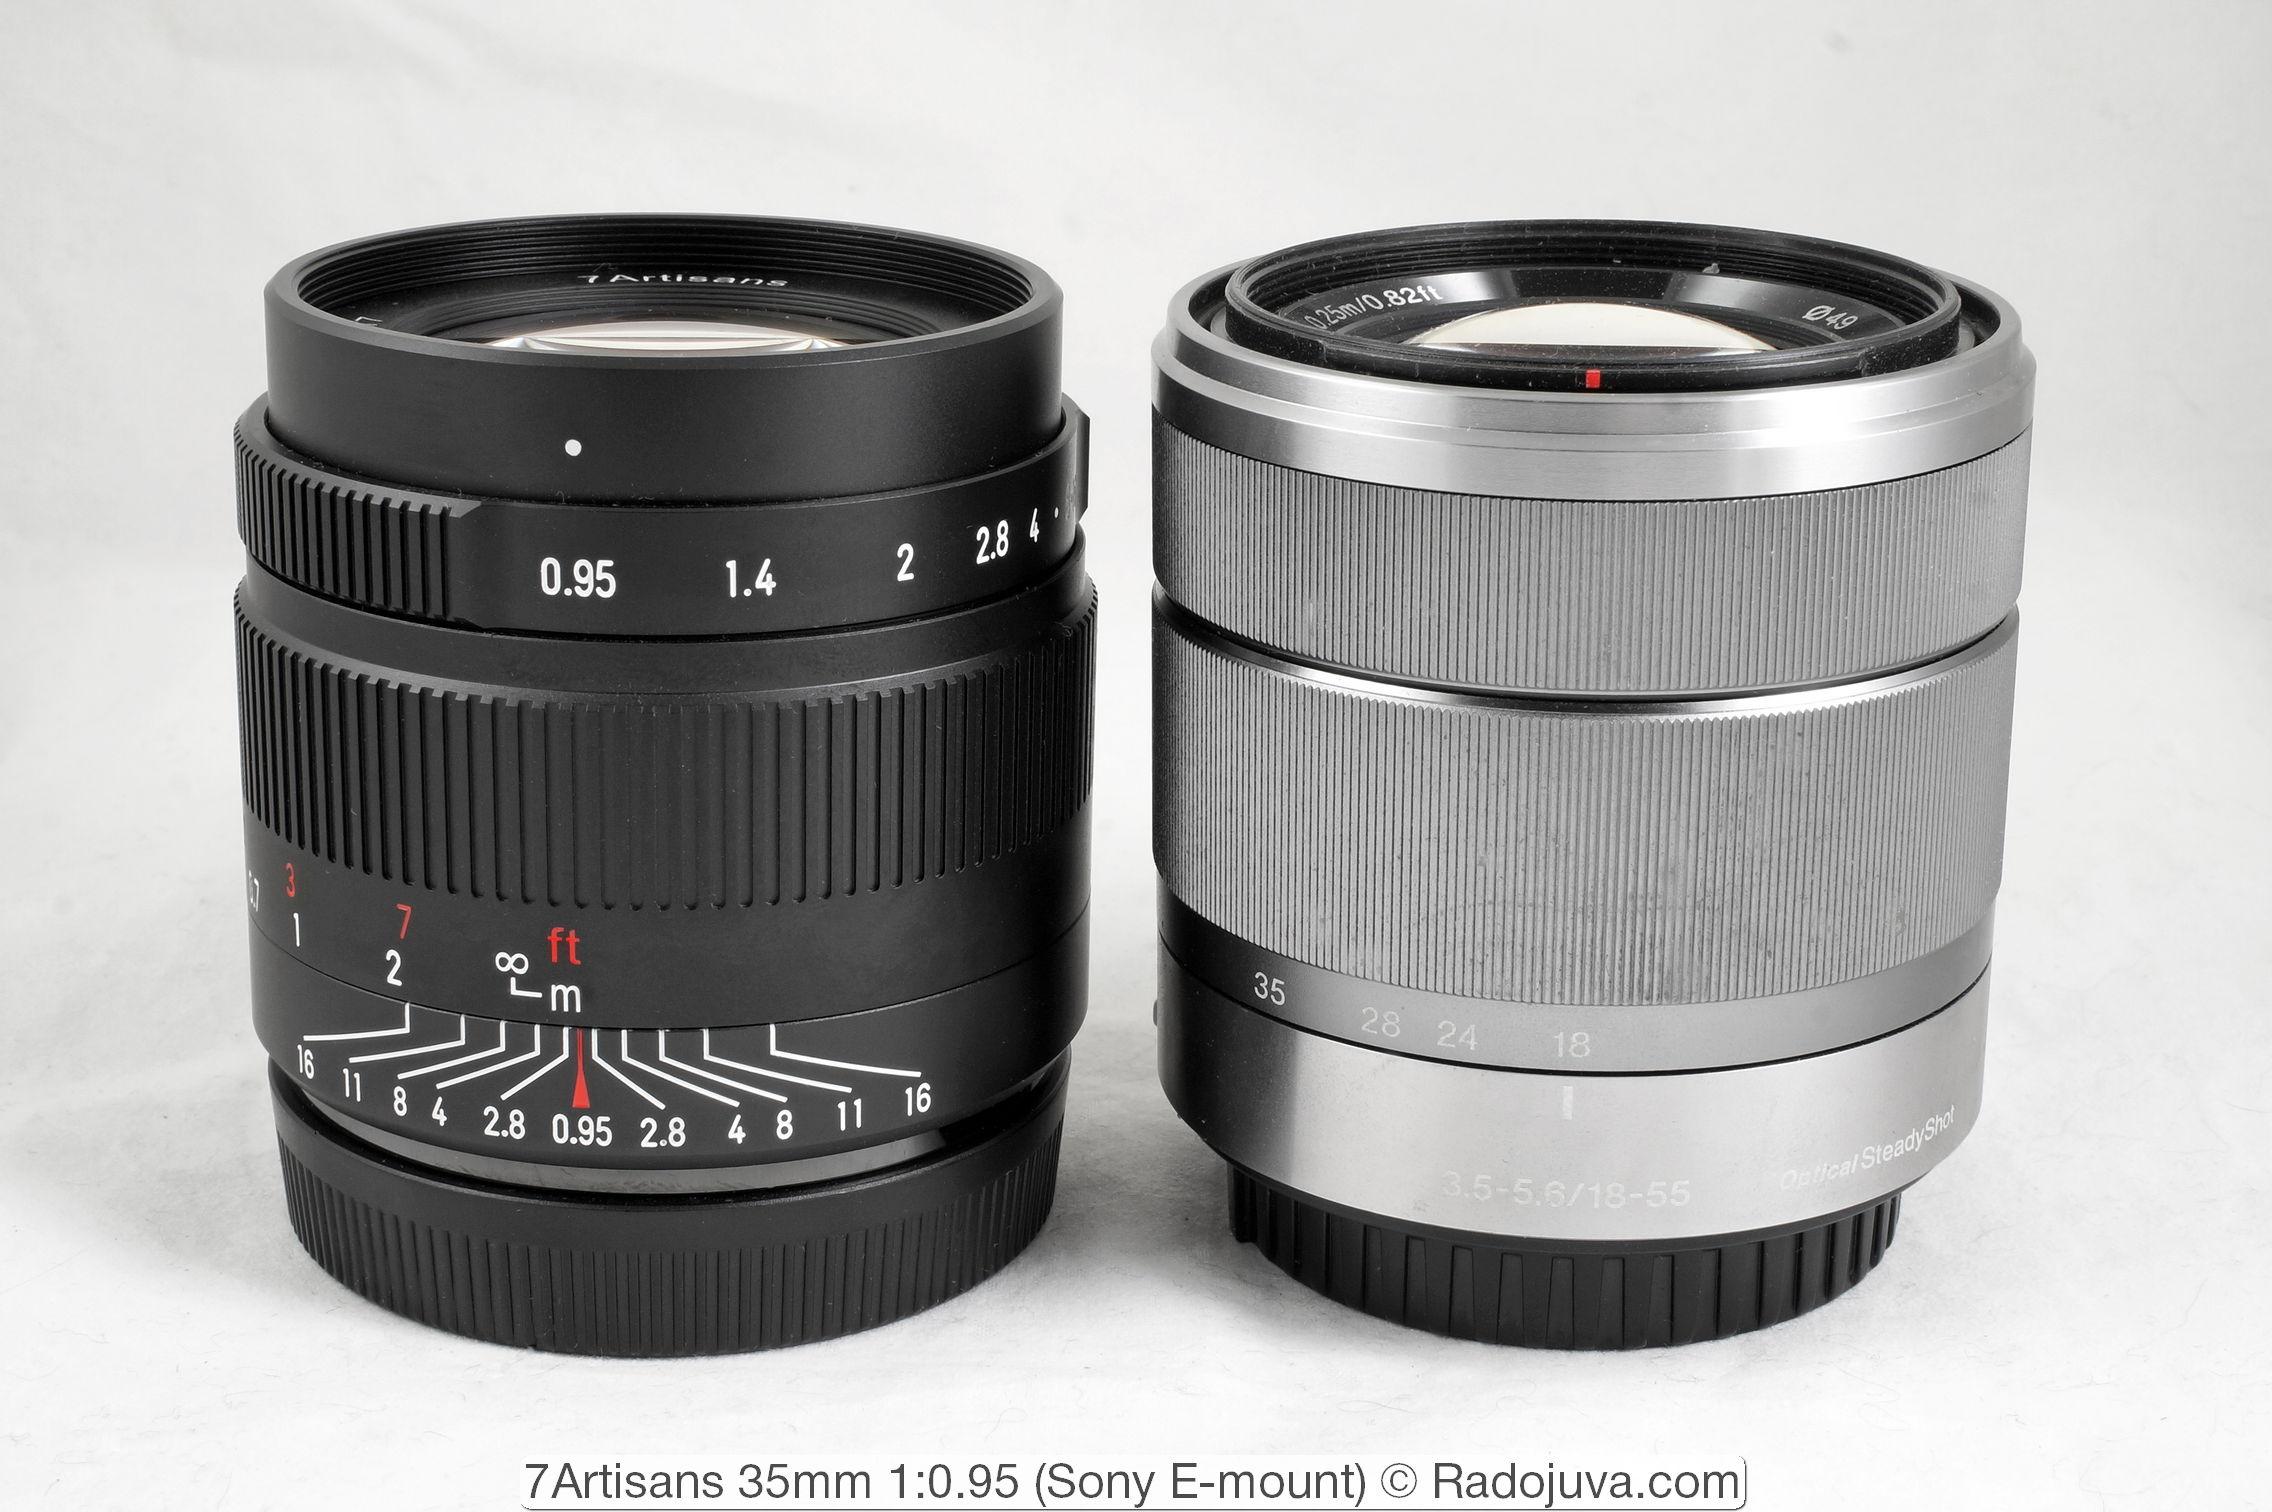 Dimensions 7Artisans 35mm 1: 0.95 for Sony E and Sony E mounts 3.5-5.6 / 18-55 OSS (Optical Steady Shot, E-mount)